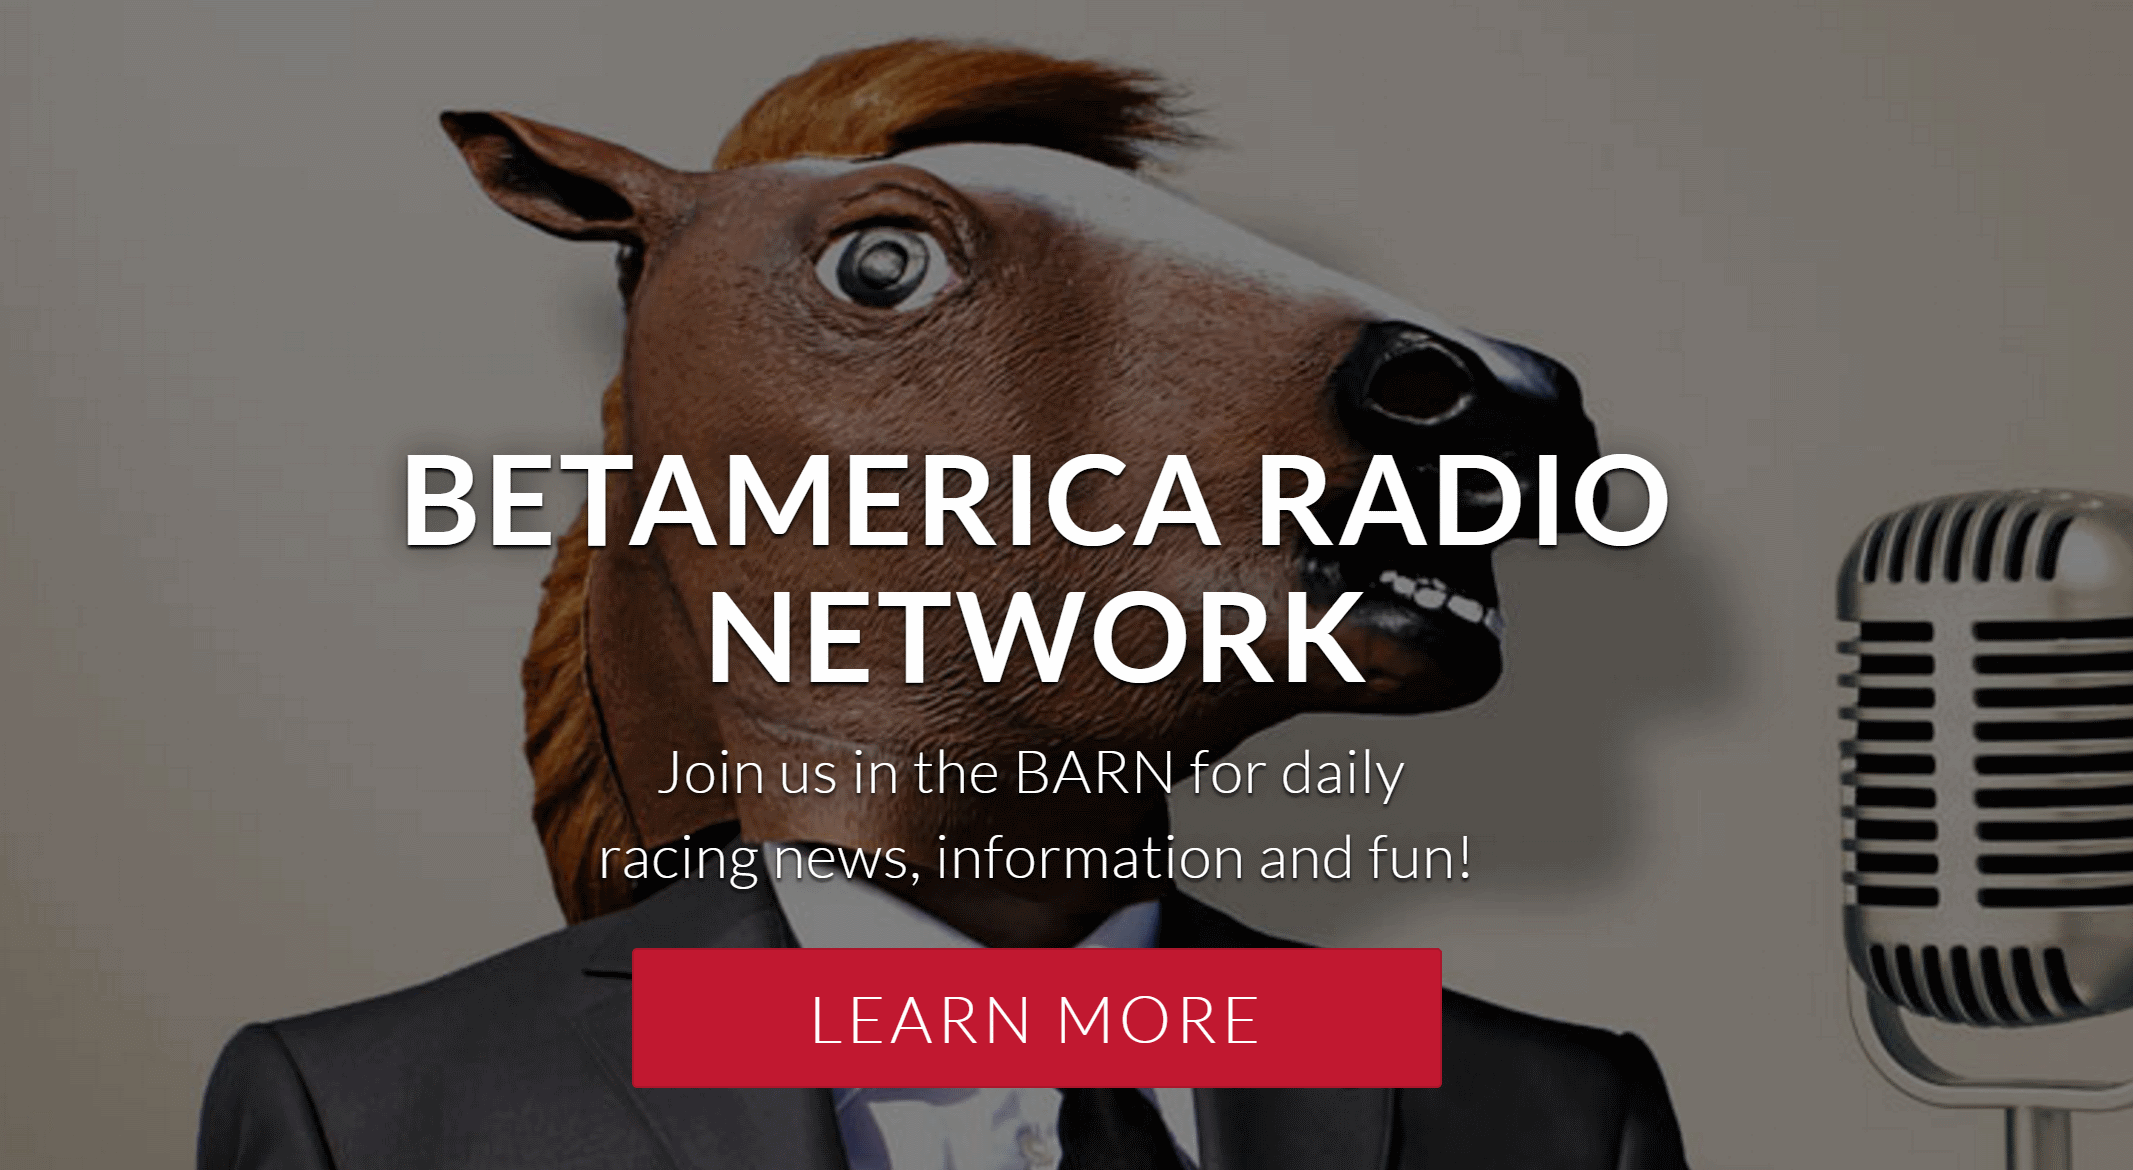 betamerica-radio